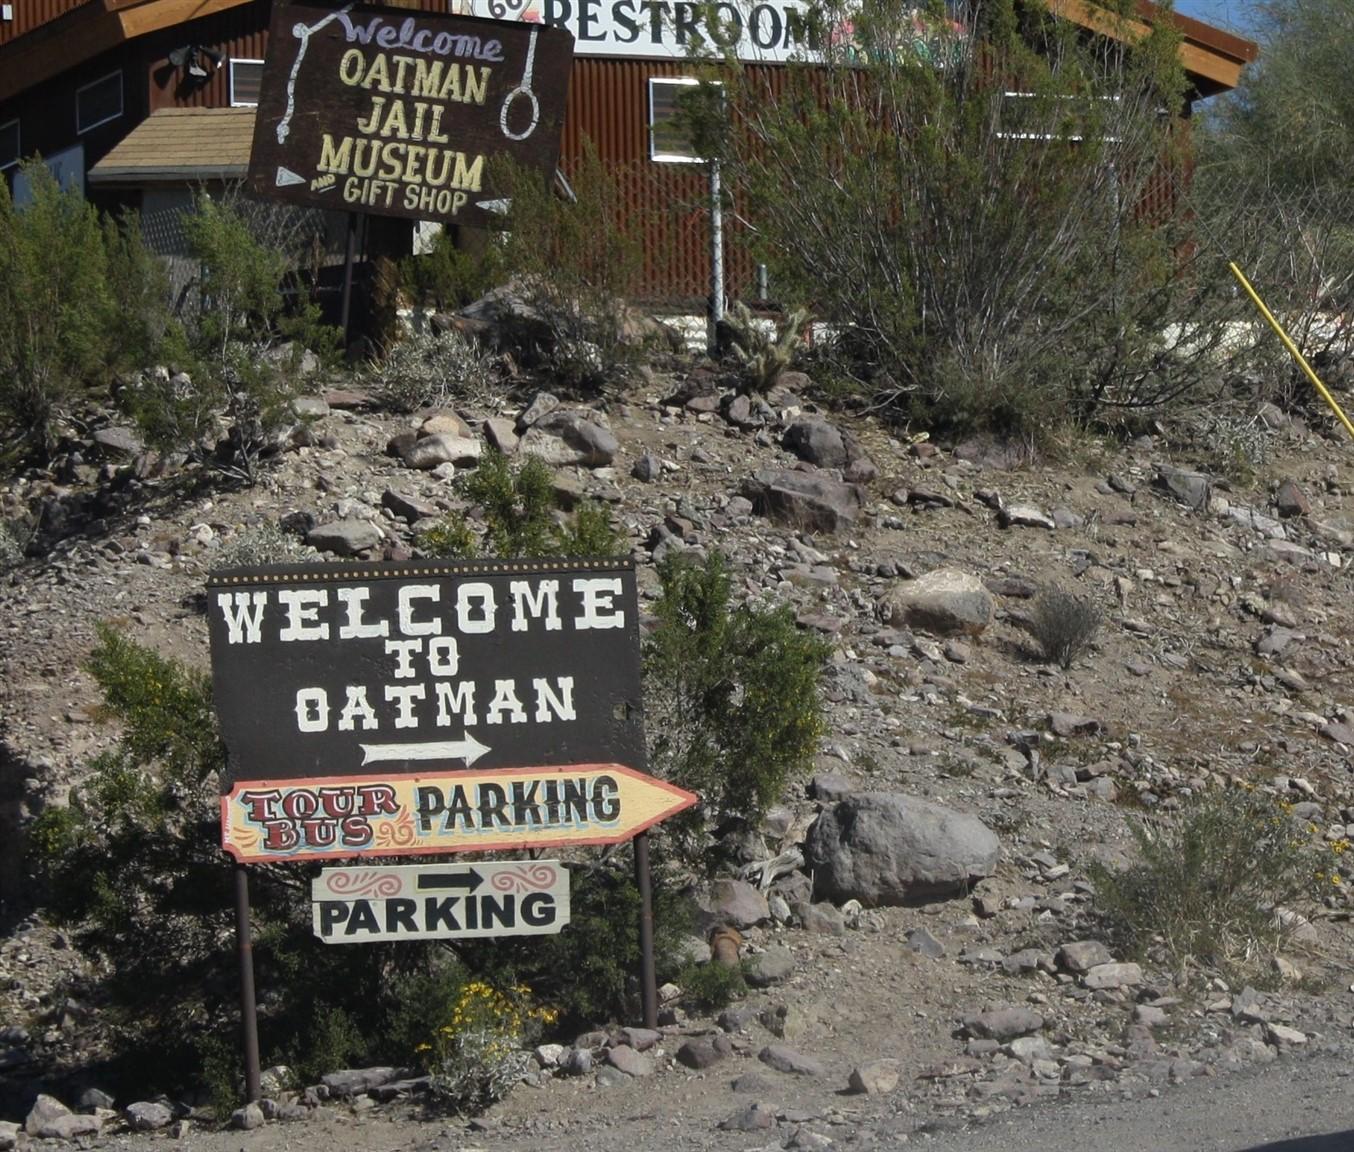 2012 03 14 Route 66 Road Trip 93 Oatman Highway Arizona.jpg